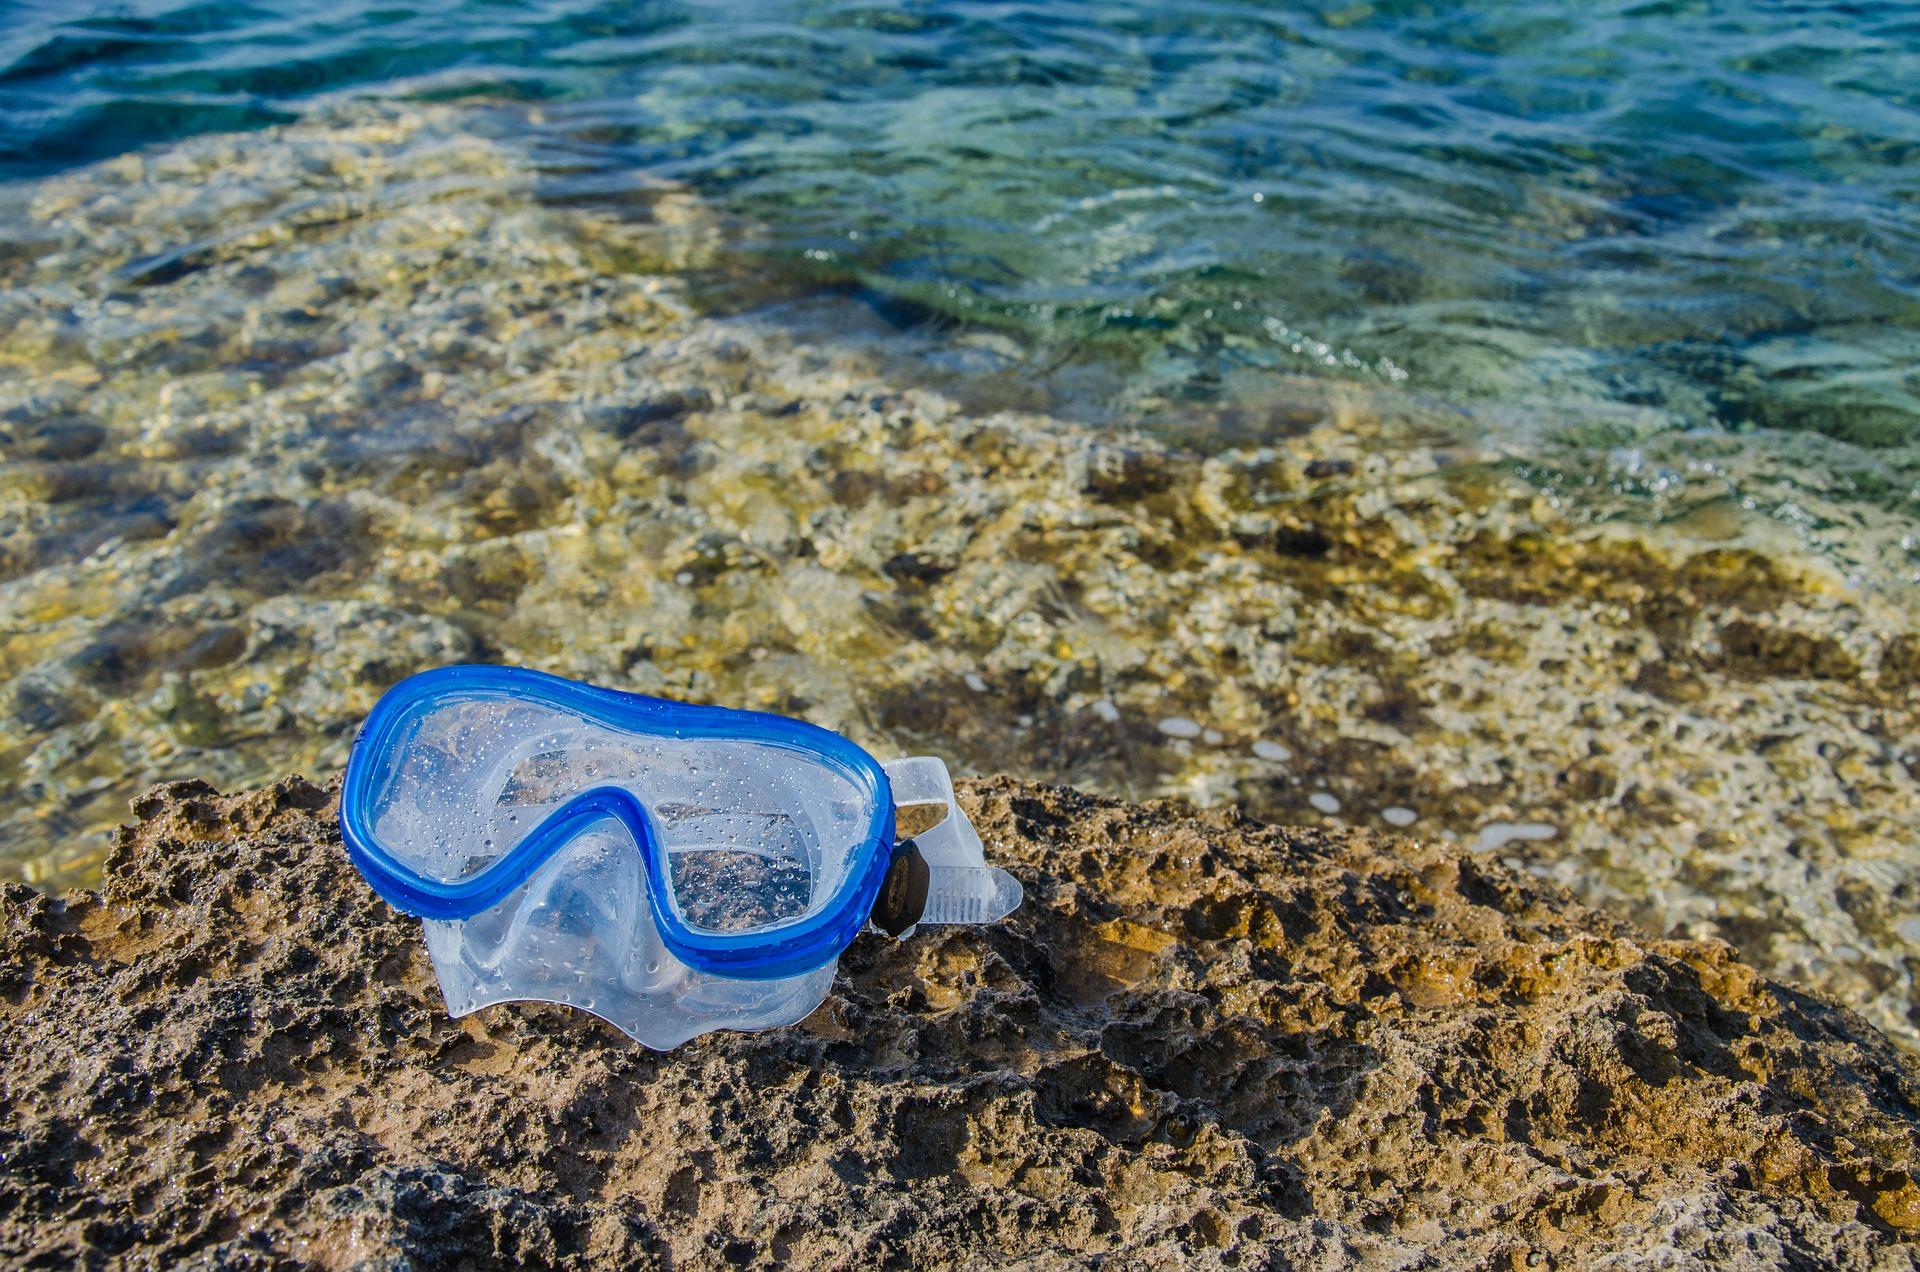 snorkeling-mask-5930431_1920